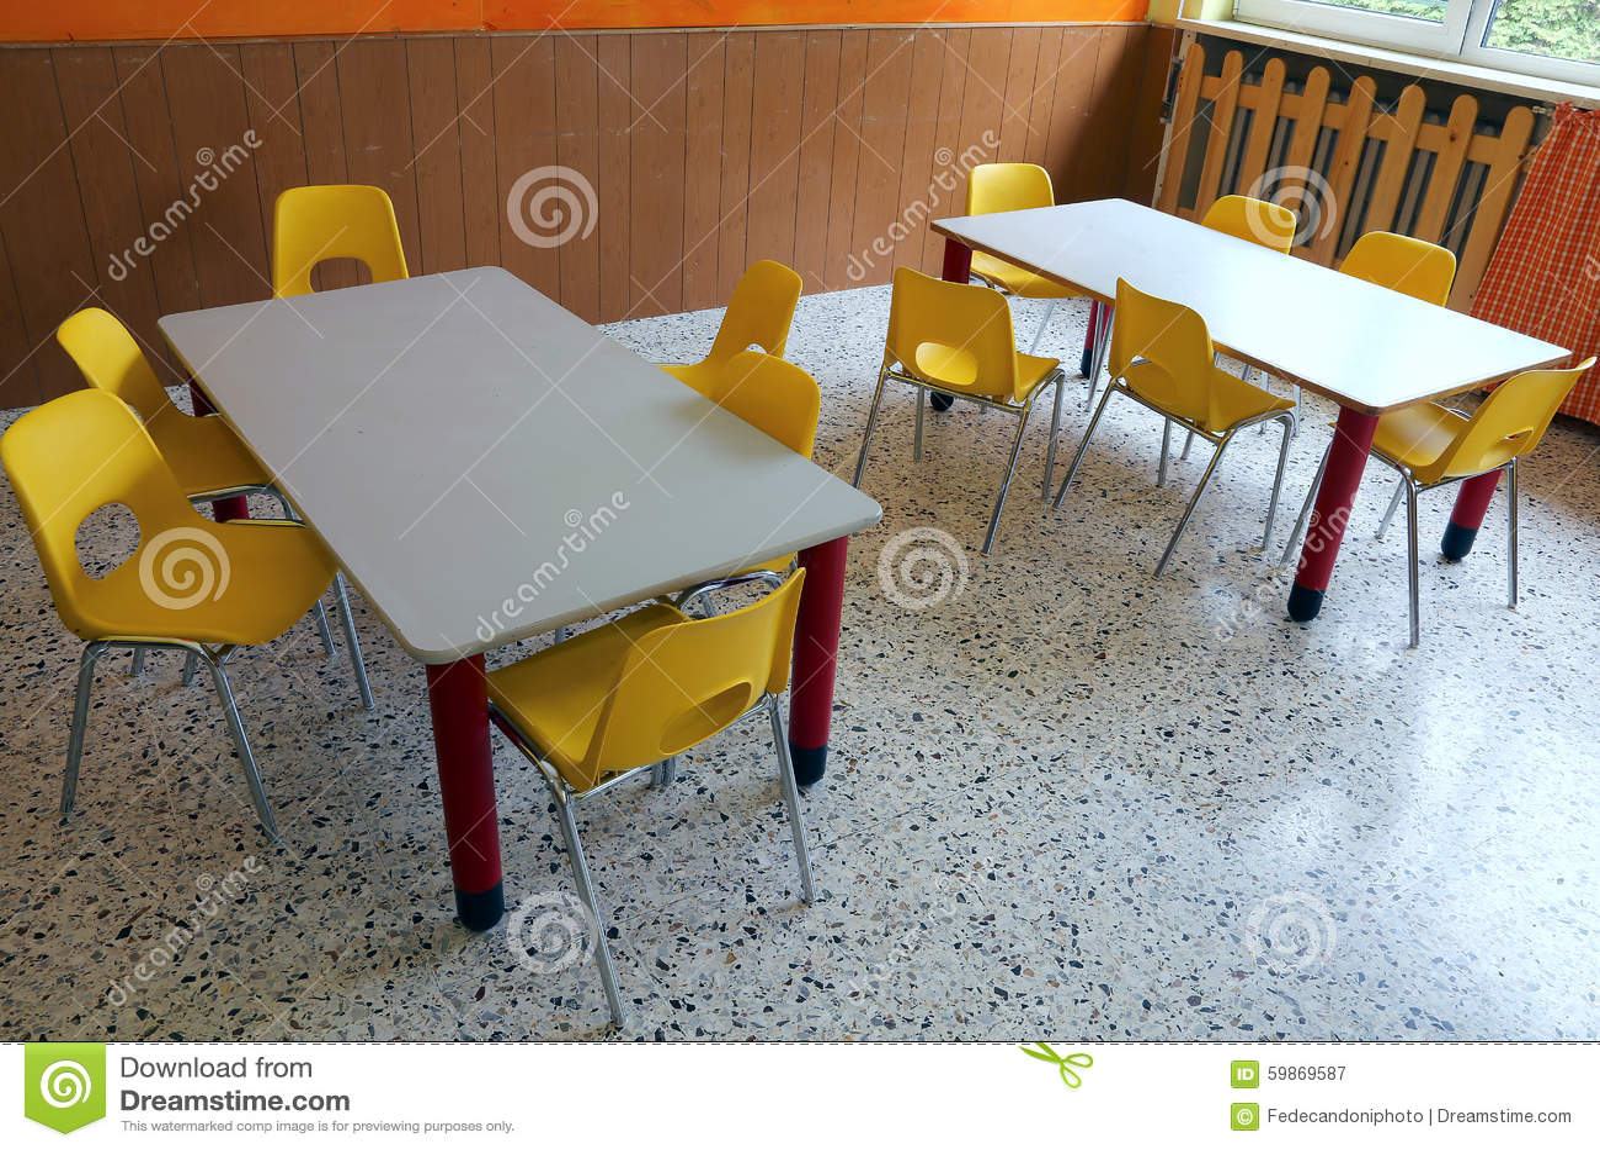 Kindergarten classroom table - Kindergarten Classroom With Desks And Yellow Chairs Stock Photo